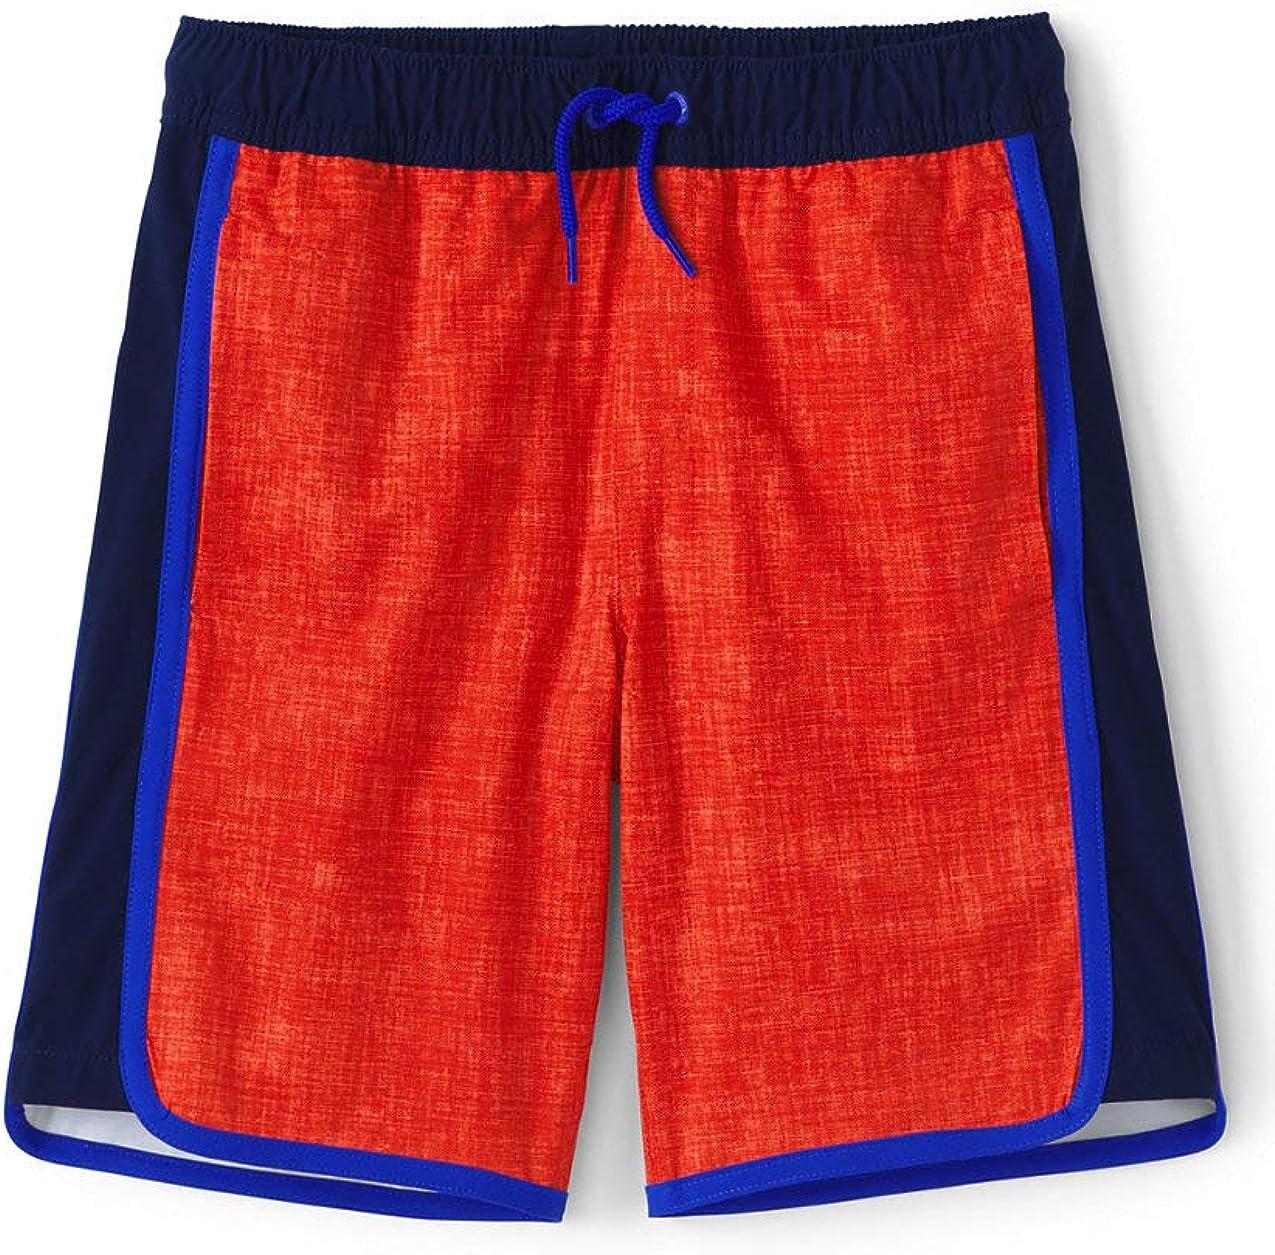 Lands End Boys Pattern Active Stretch Swim Trunks